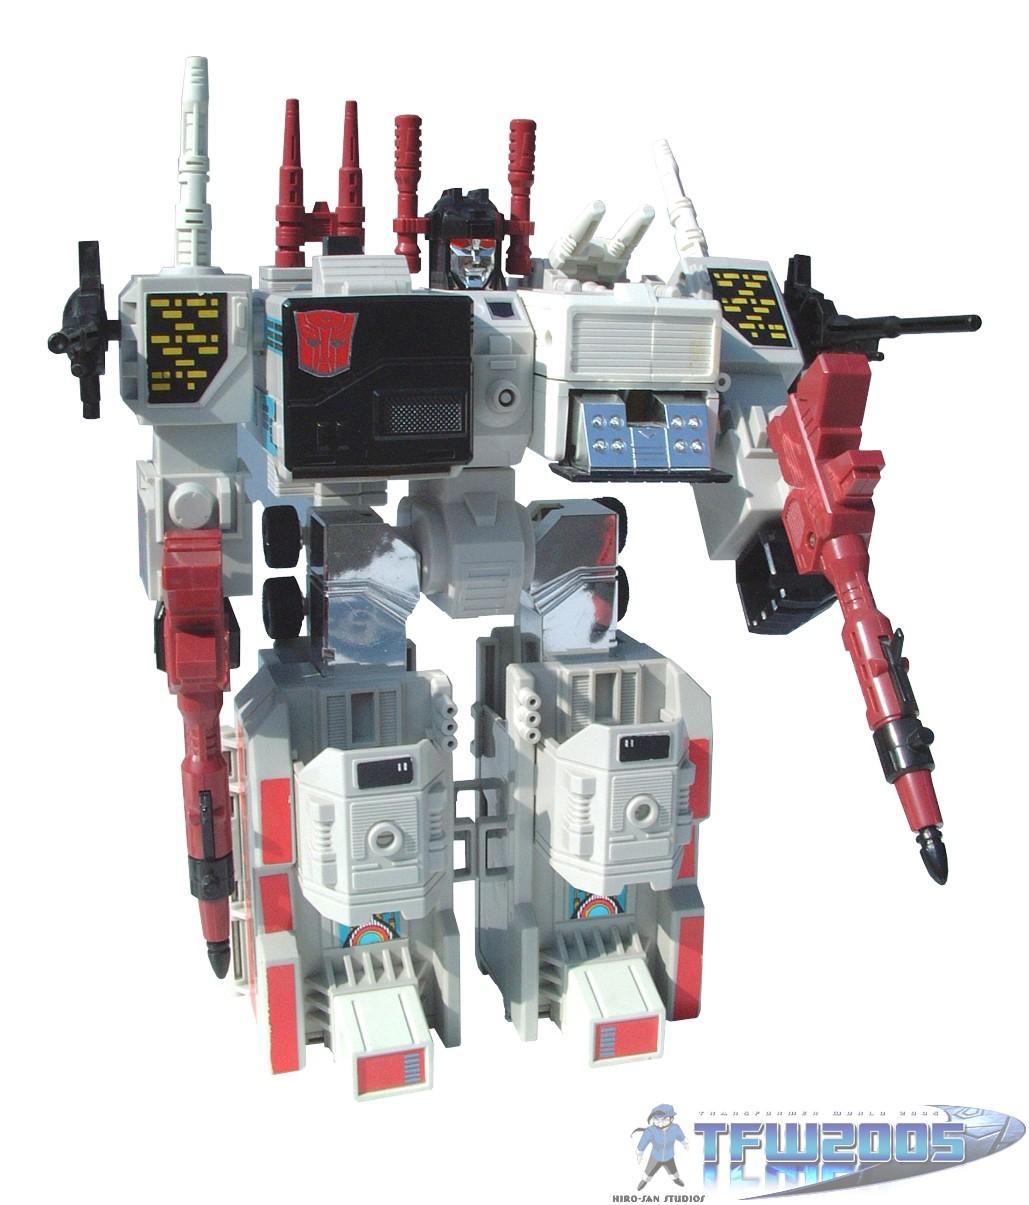 Metroplex Transformers Toys Tfw2005